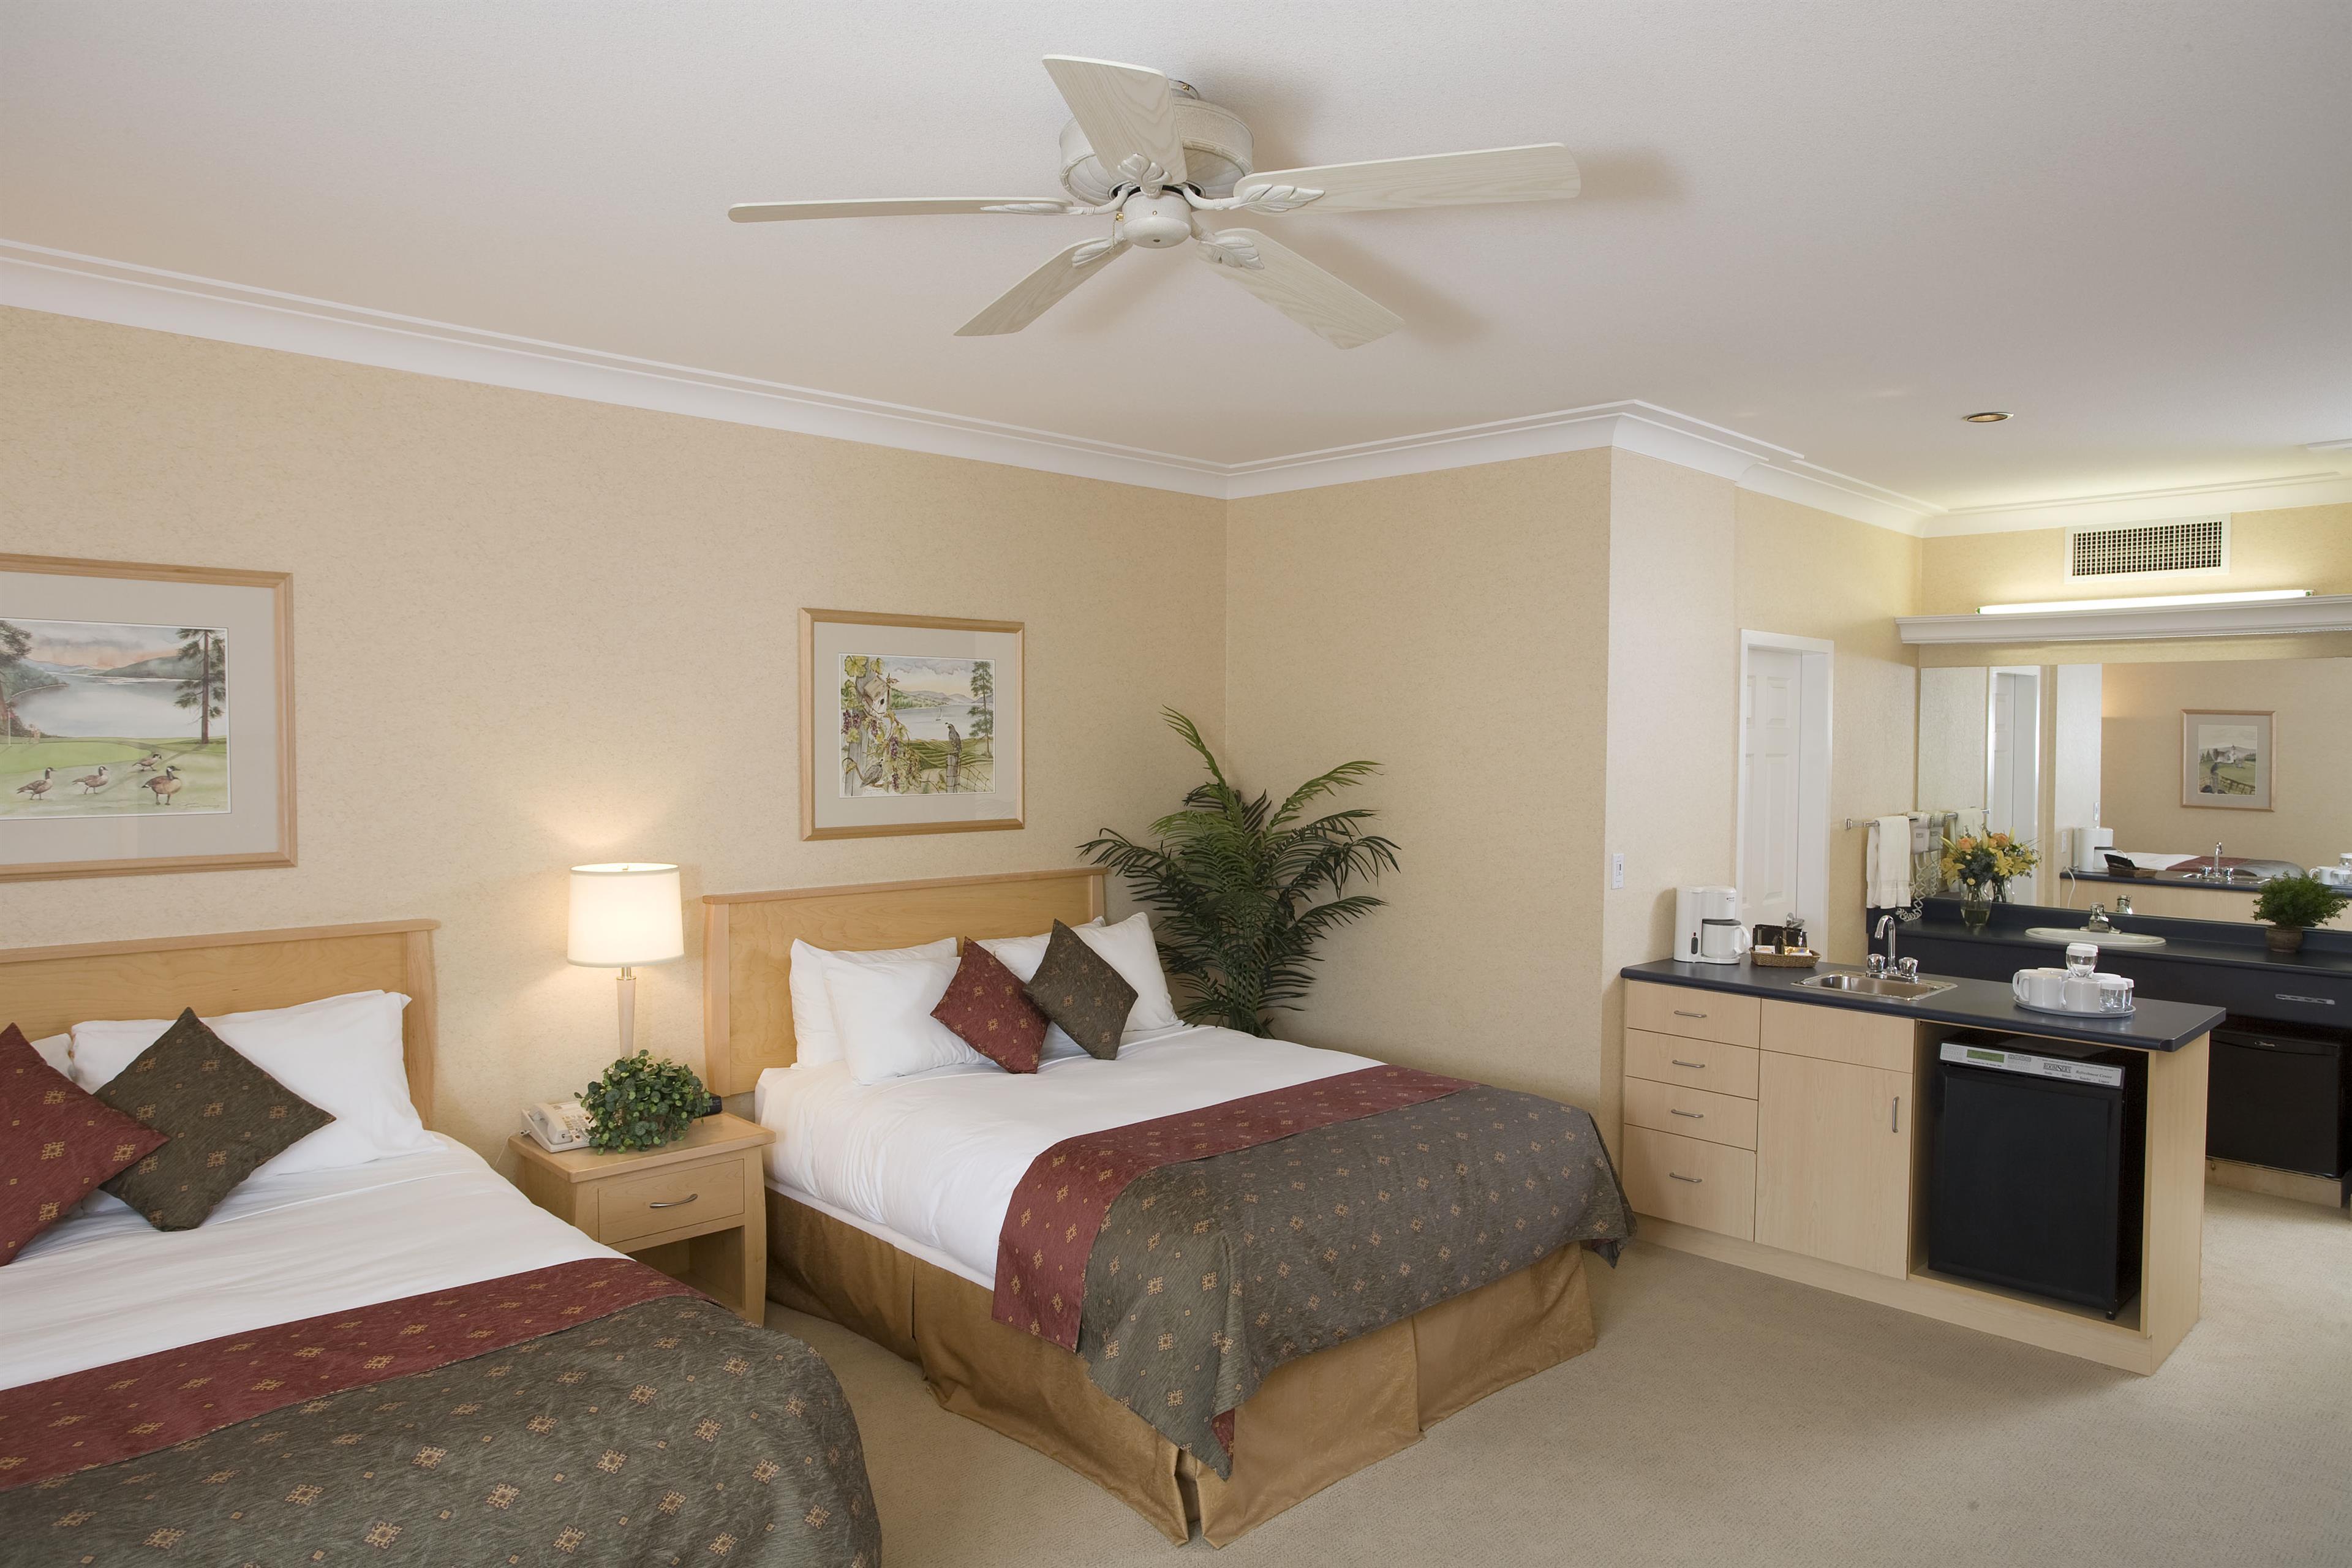 Best Western Plus Kelowna Hotel & Suites in Kelowna: Deluxe with 2 Queens & Wetbar